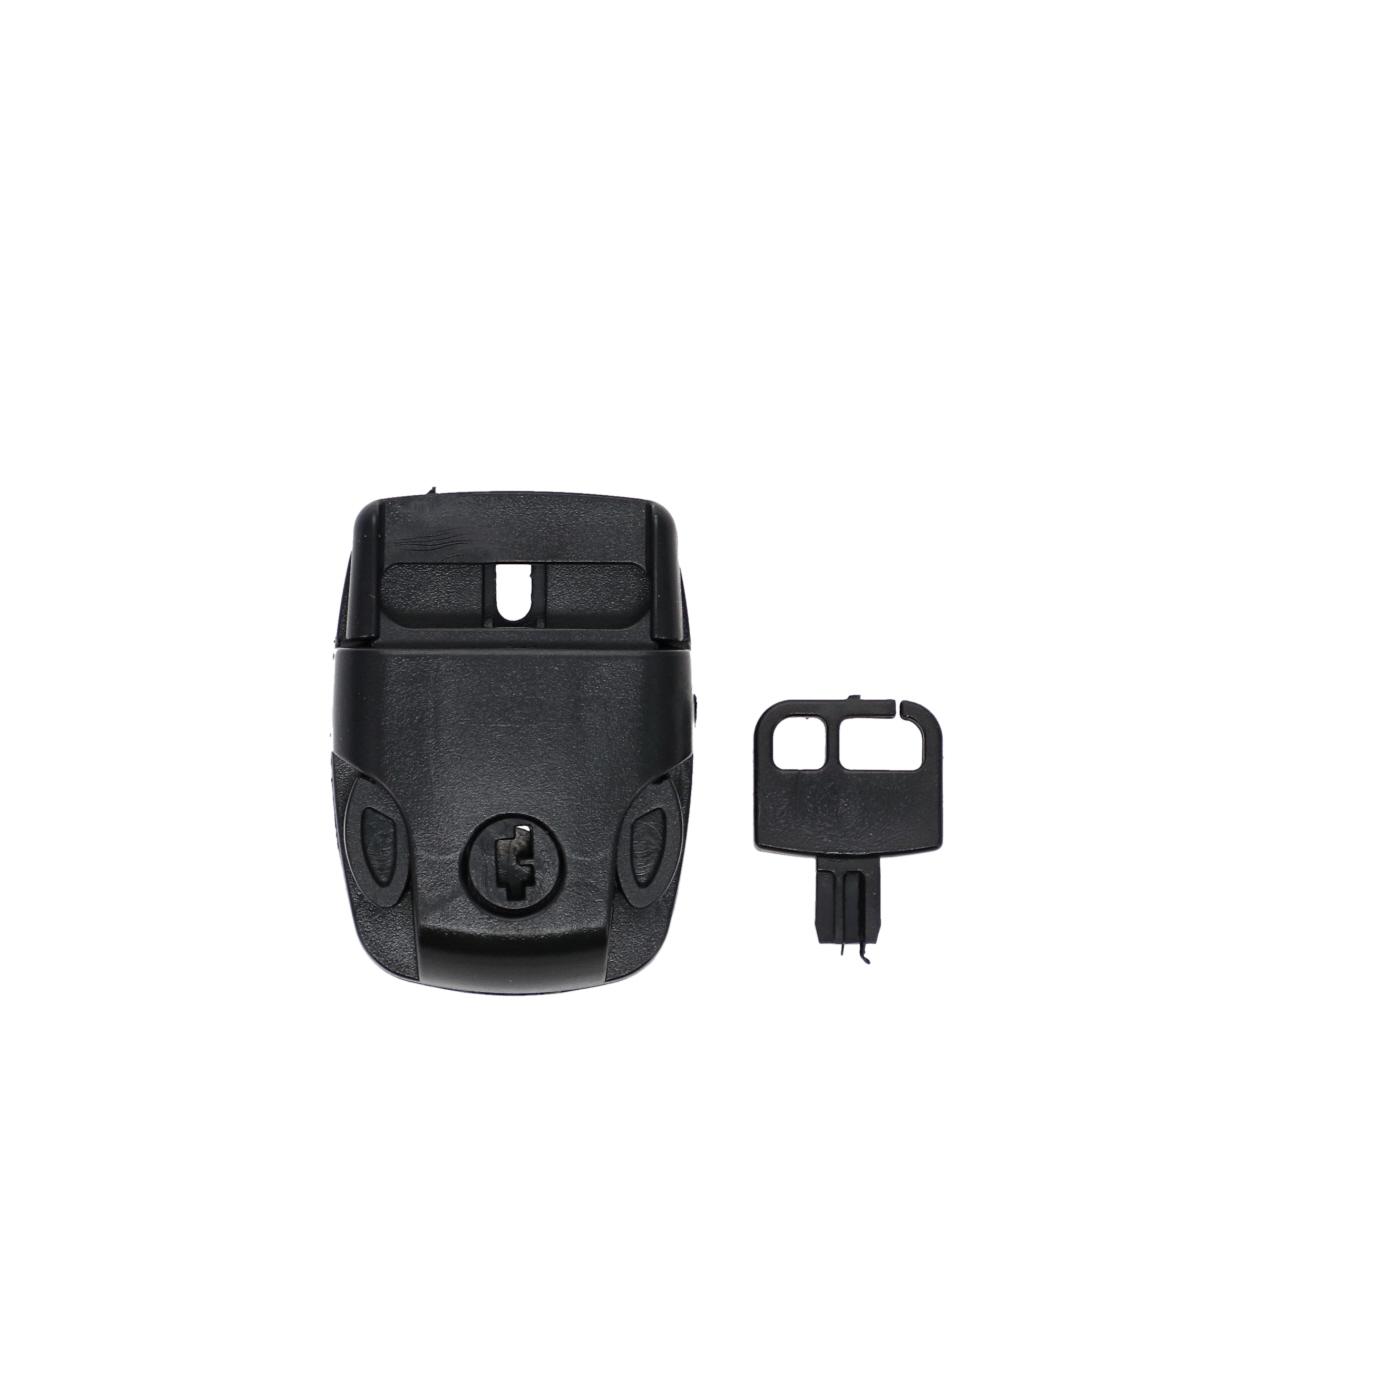 Key locks for spa cover